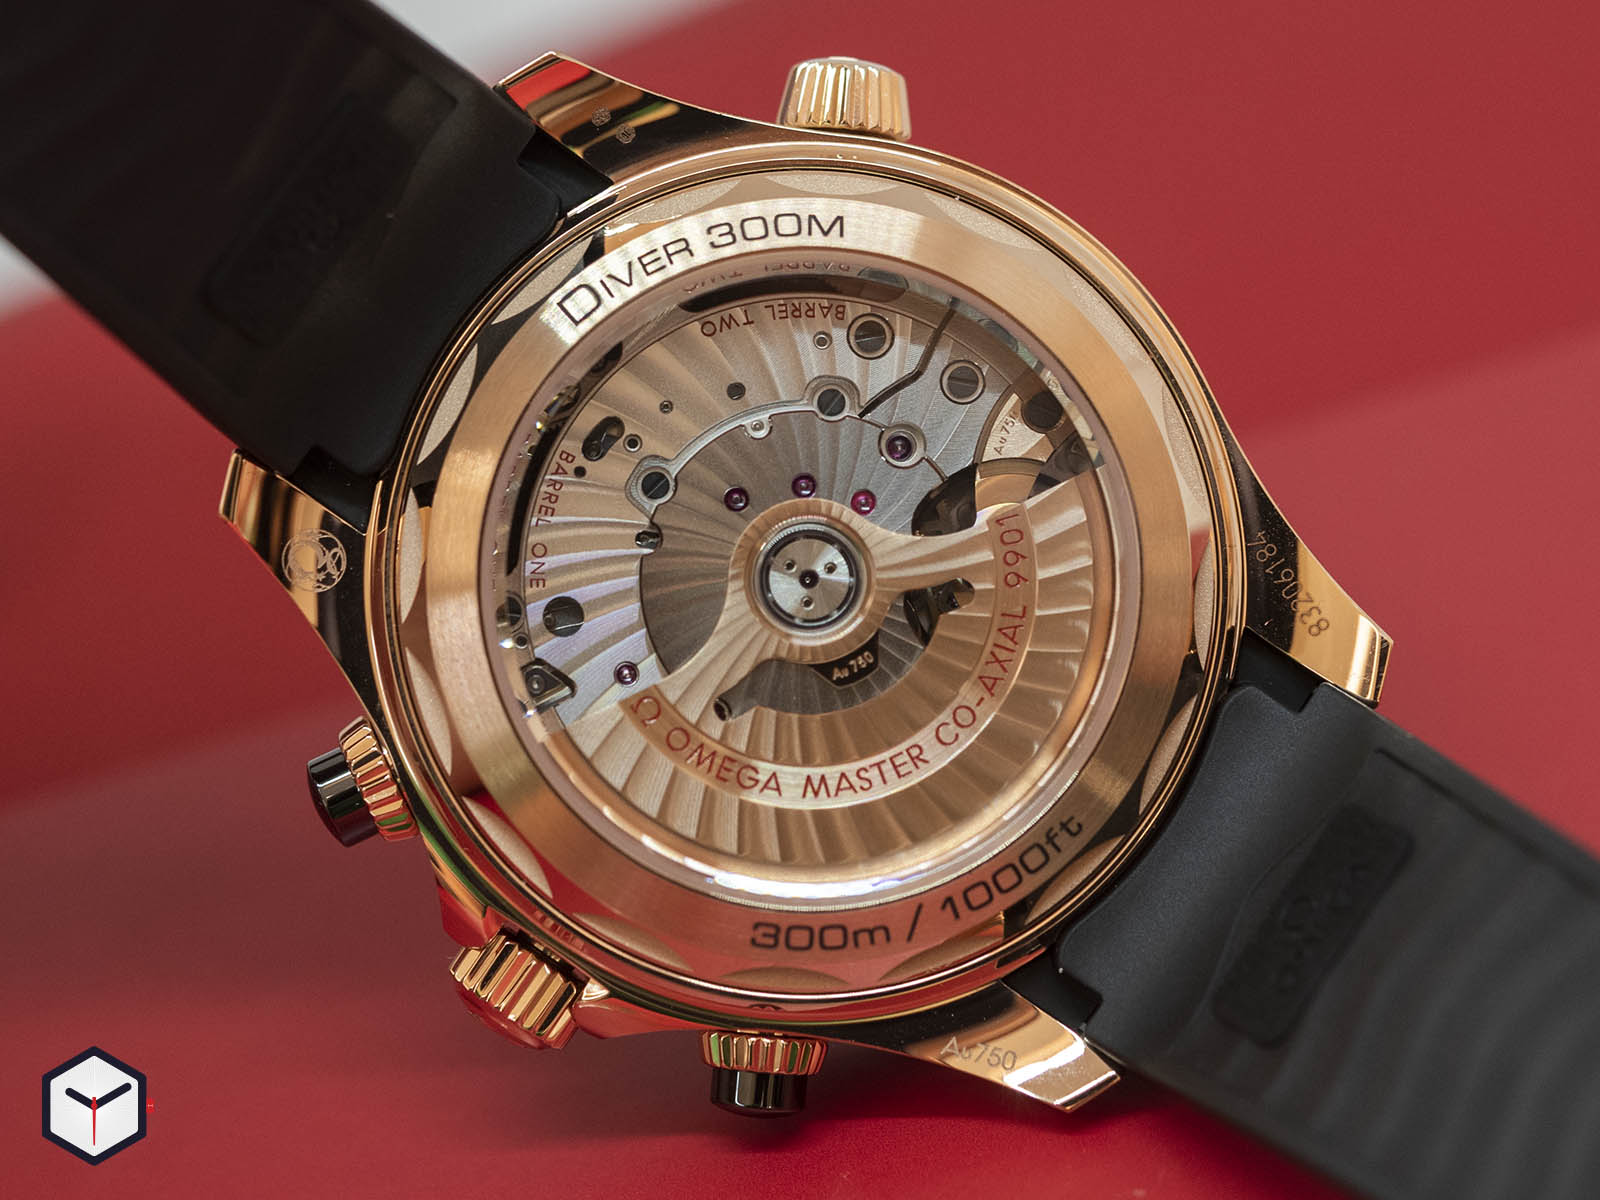 210-62-44-51-01-001-omega-seamaster-diver-300m-co-axial-master-chronometer-chronograph-5.jpg